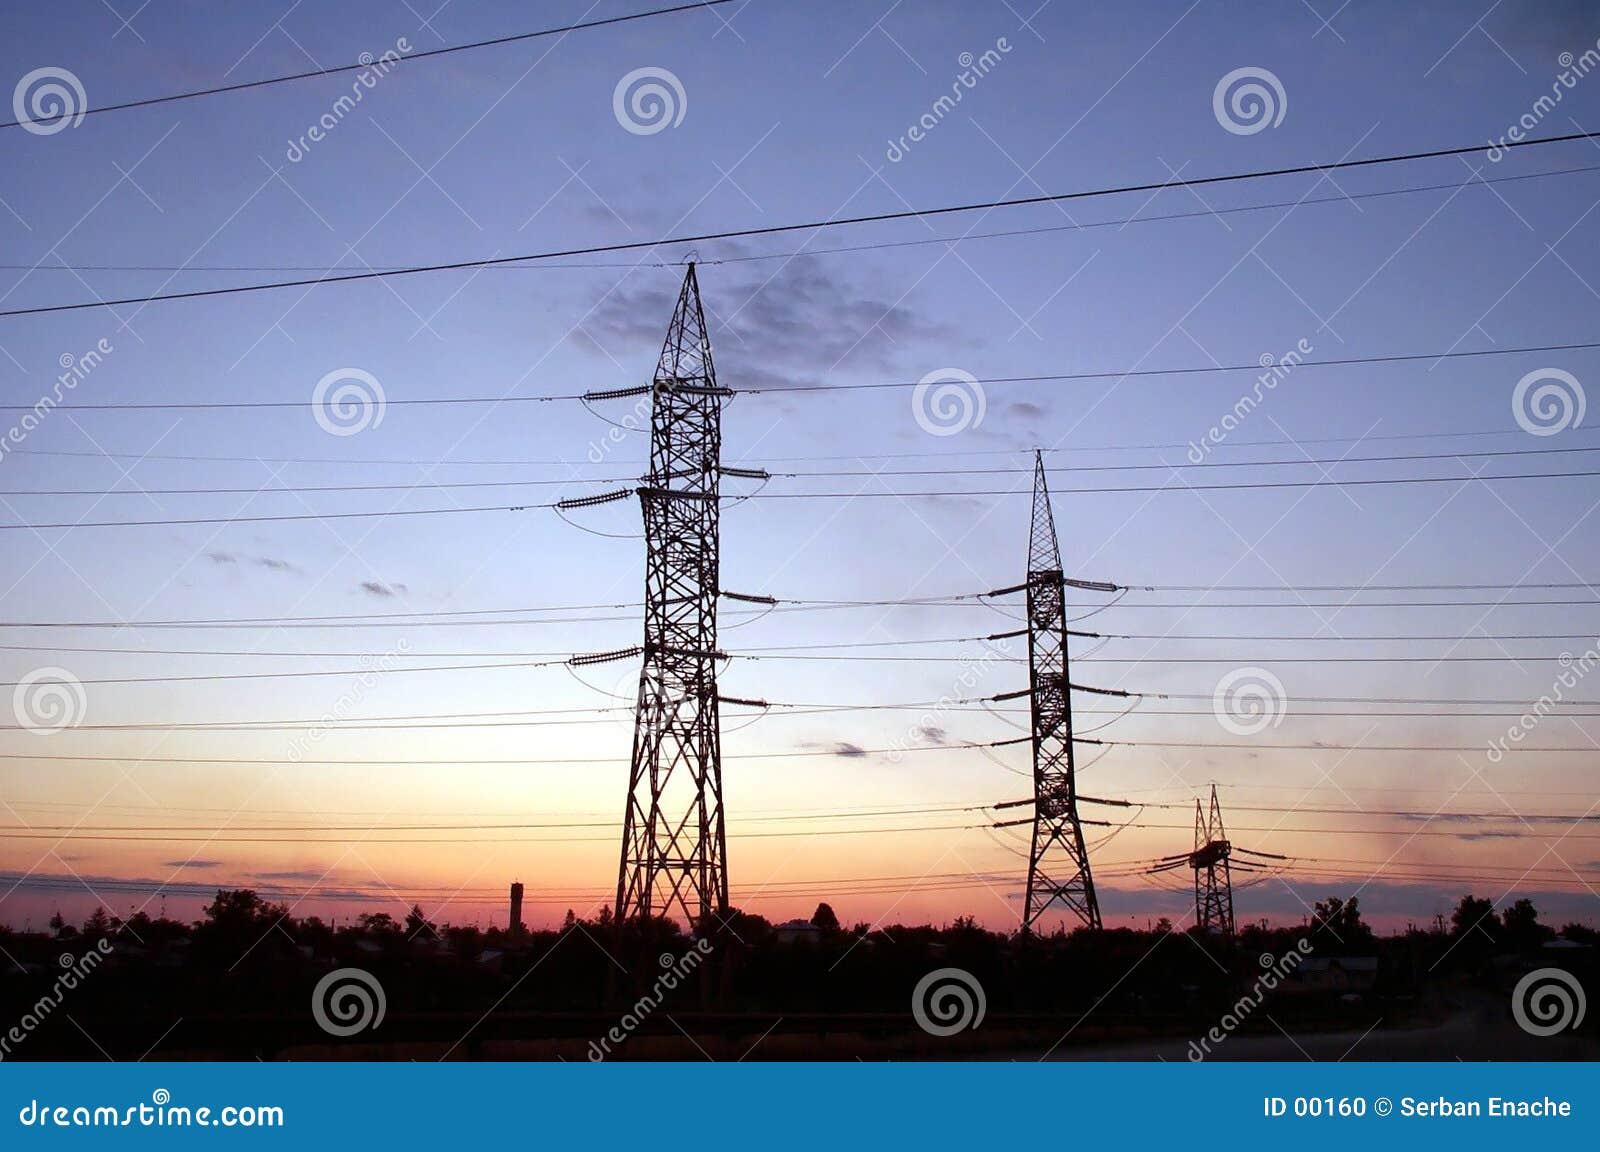 Electrical pillars